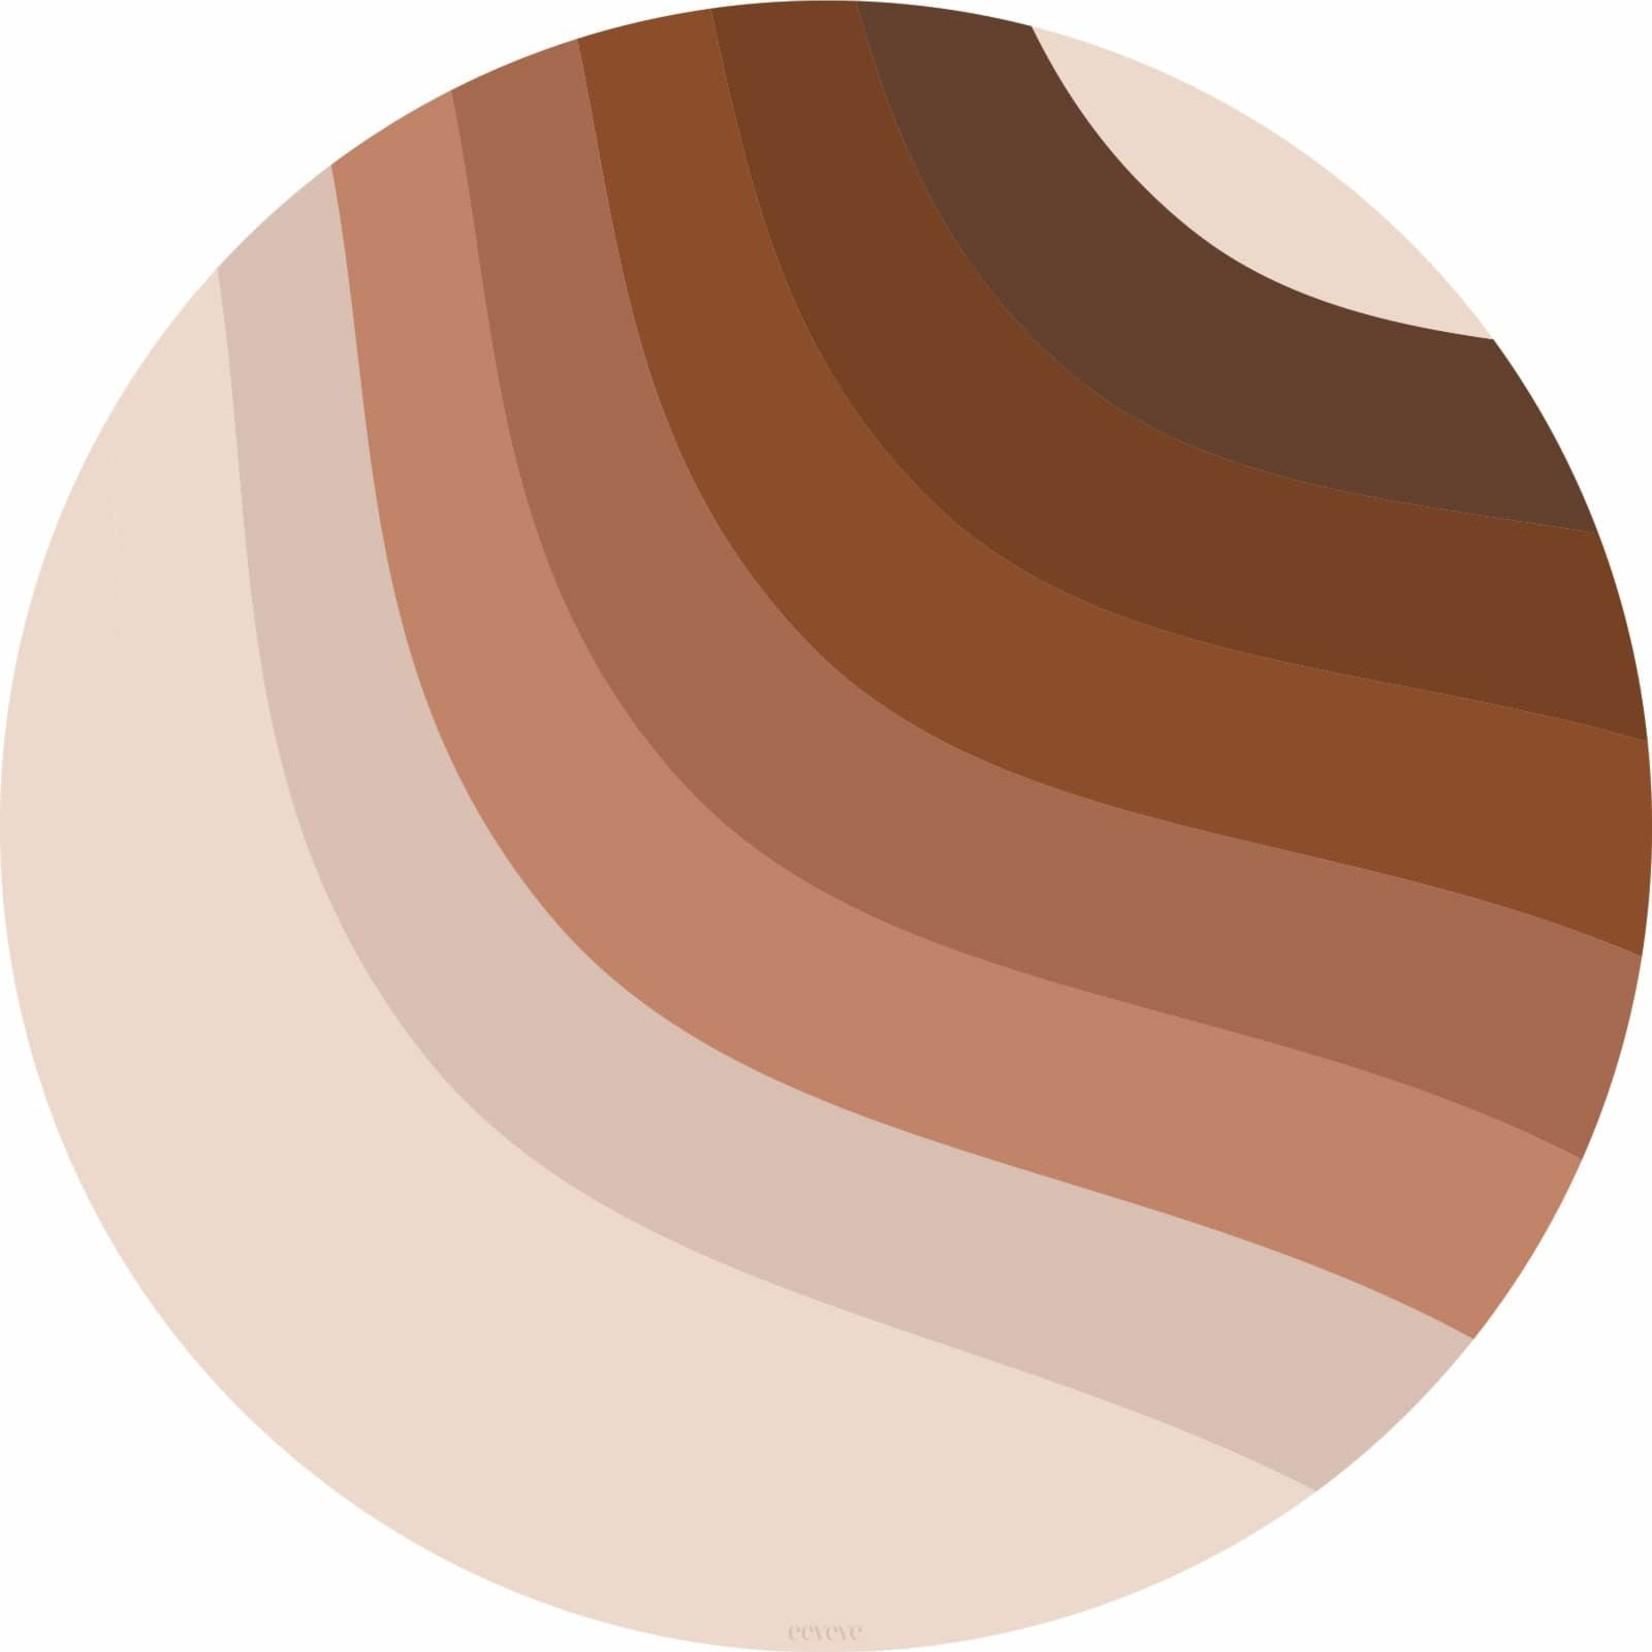 Eeveve Eeveve Round Splash Mat Retro Lines - Brown